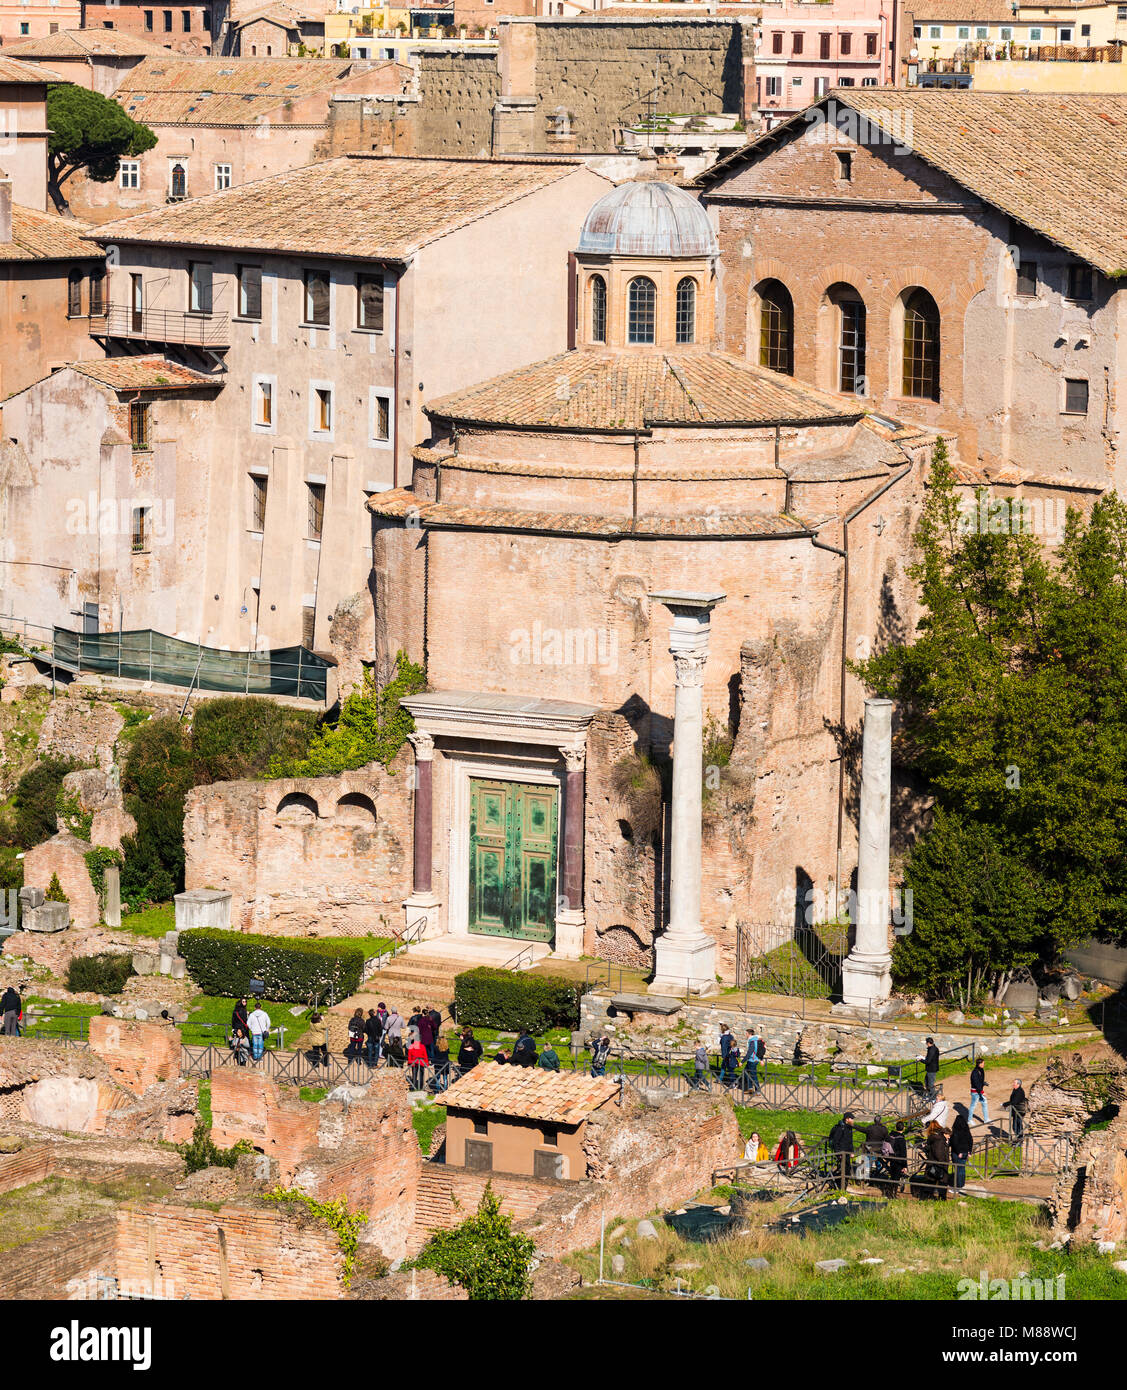 Ancient Rome city skyline with Santi Cosma e Damiano church at the Roman Forum. Rome. Lazio. Italy. - Stock Image